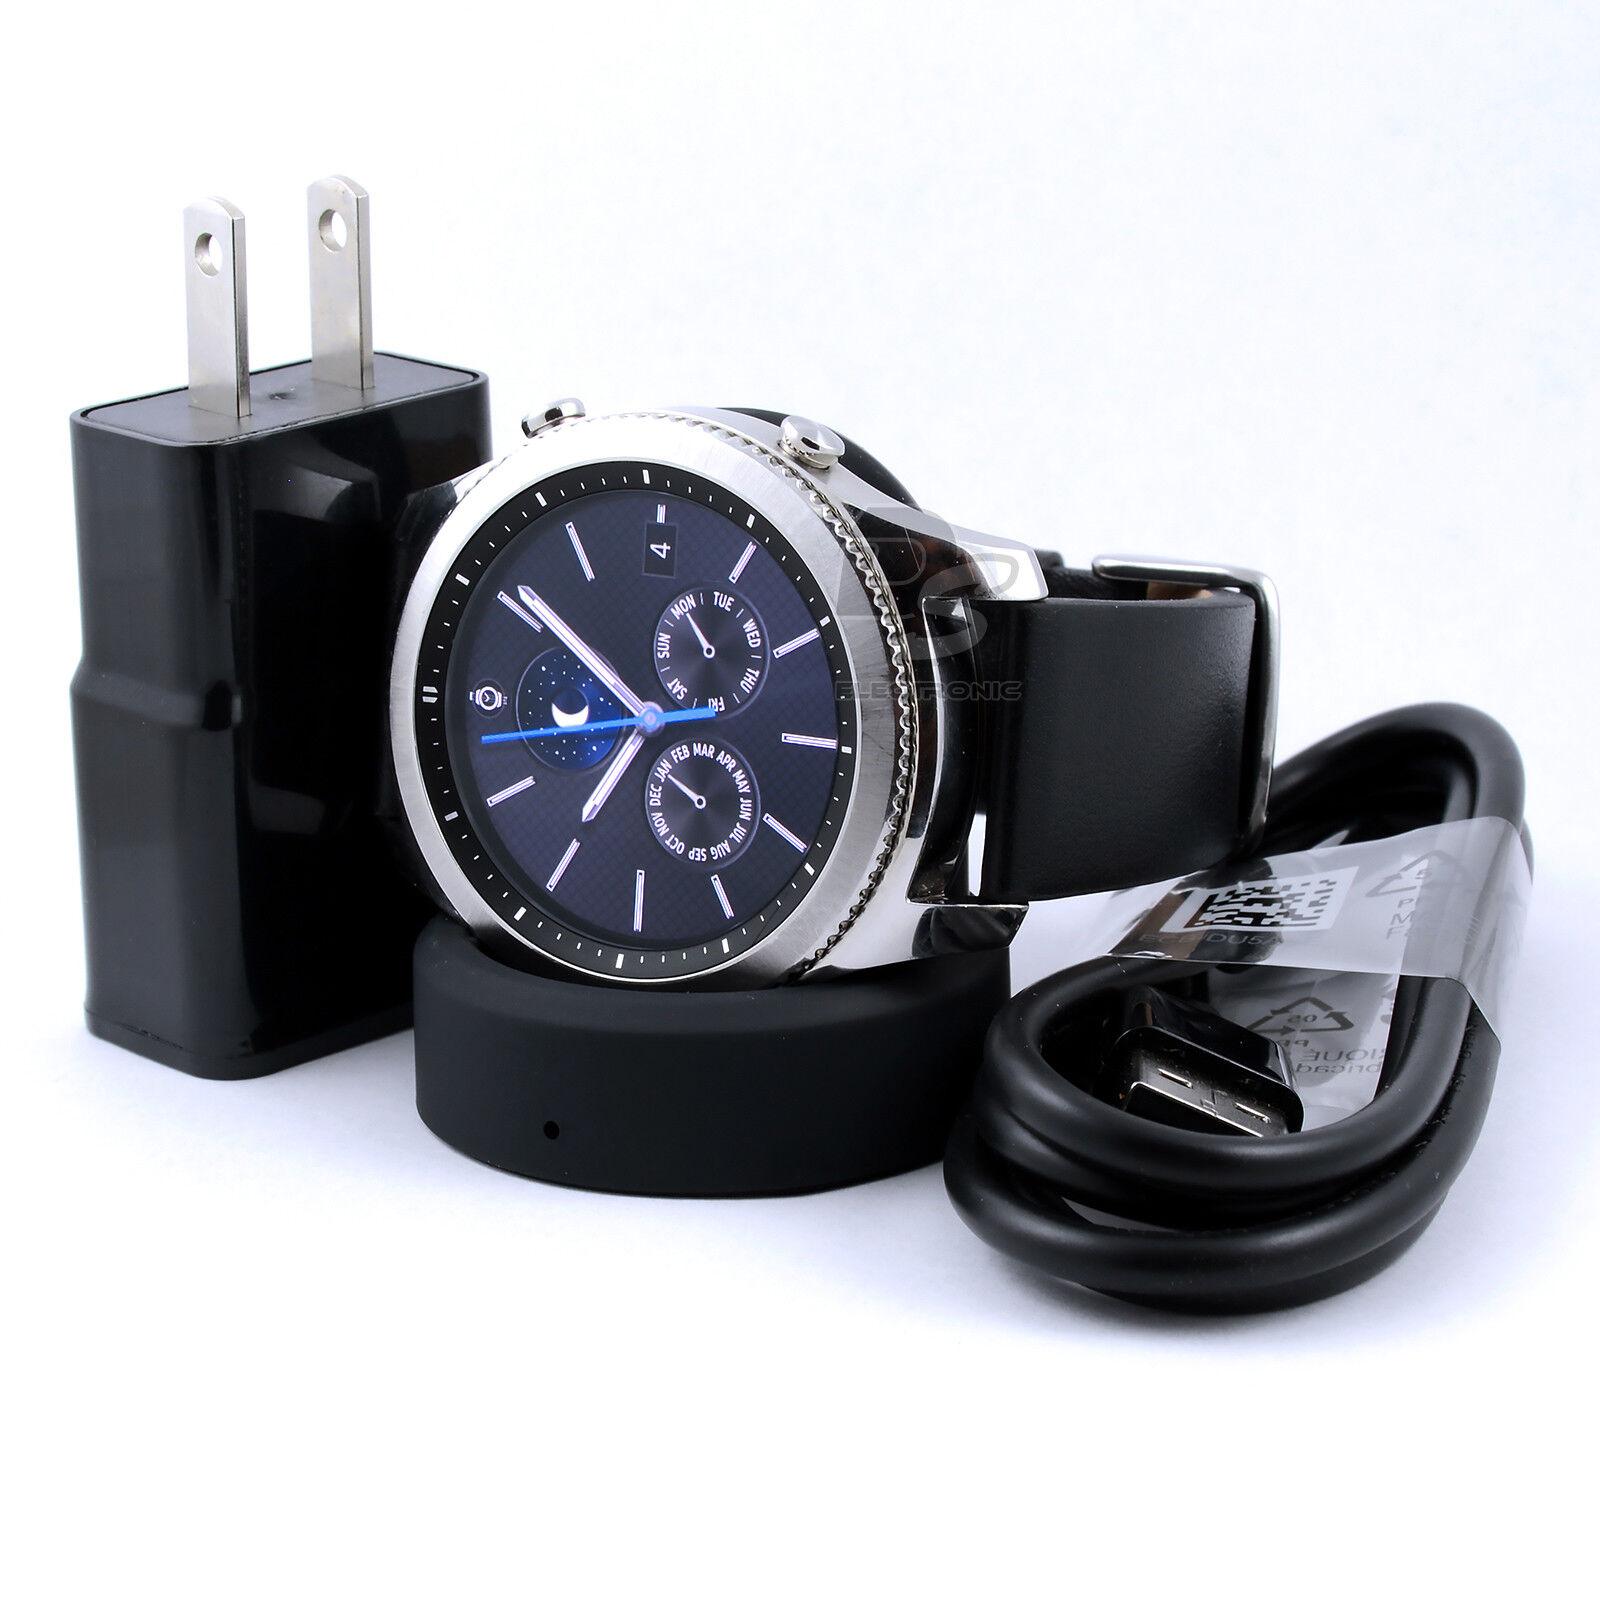 Samsung Gear S3 Classic SM-R770 Smartwatch SM-R770NZSAXAR